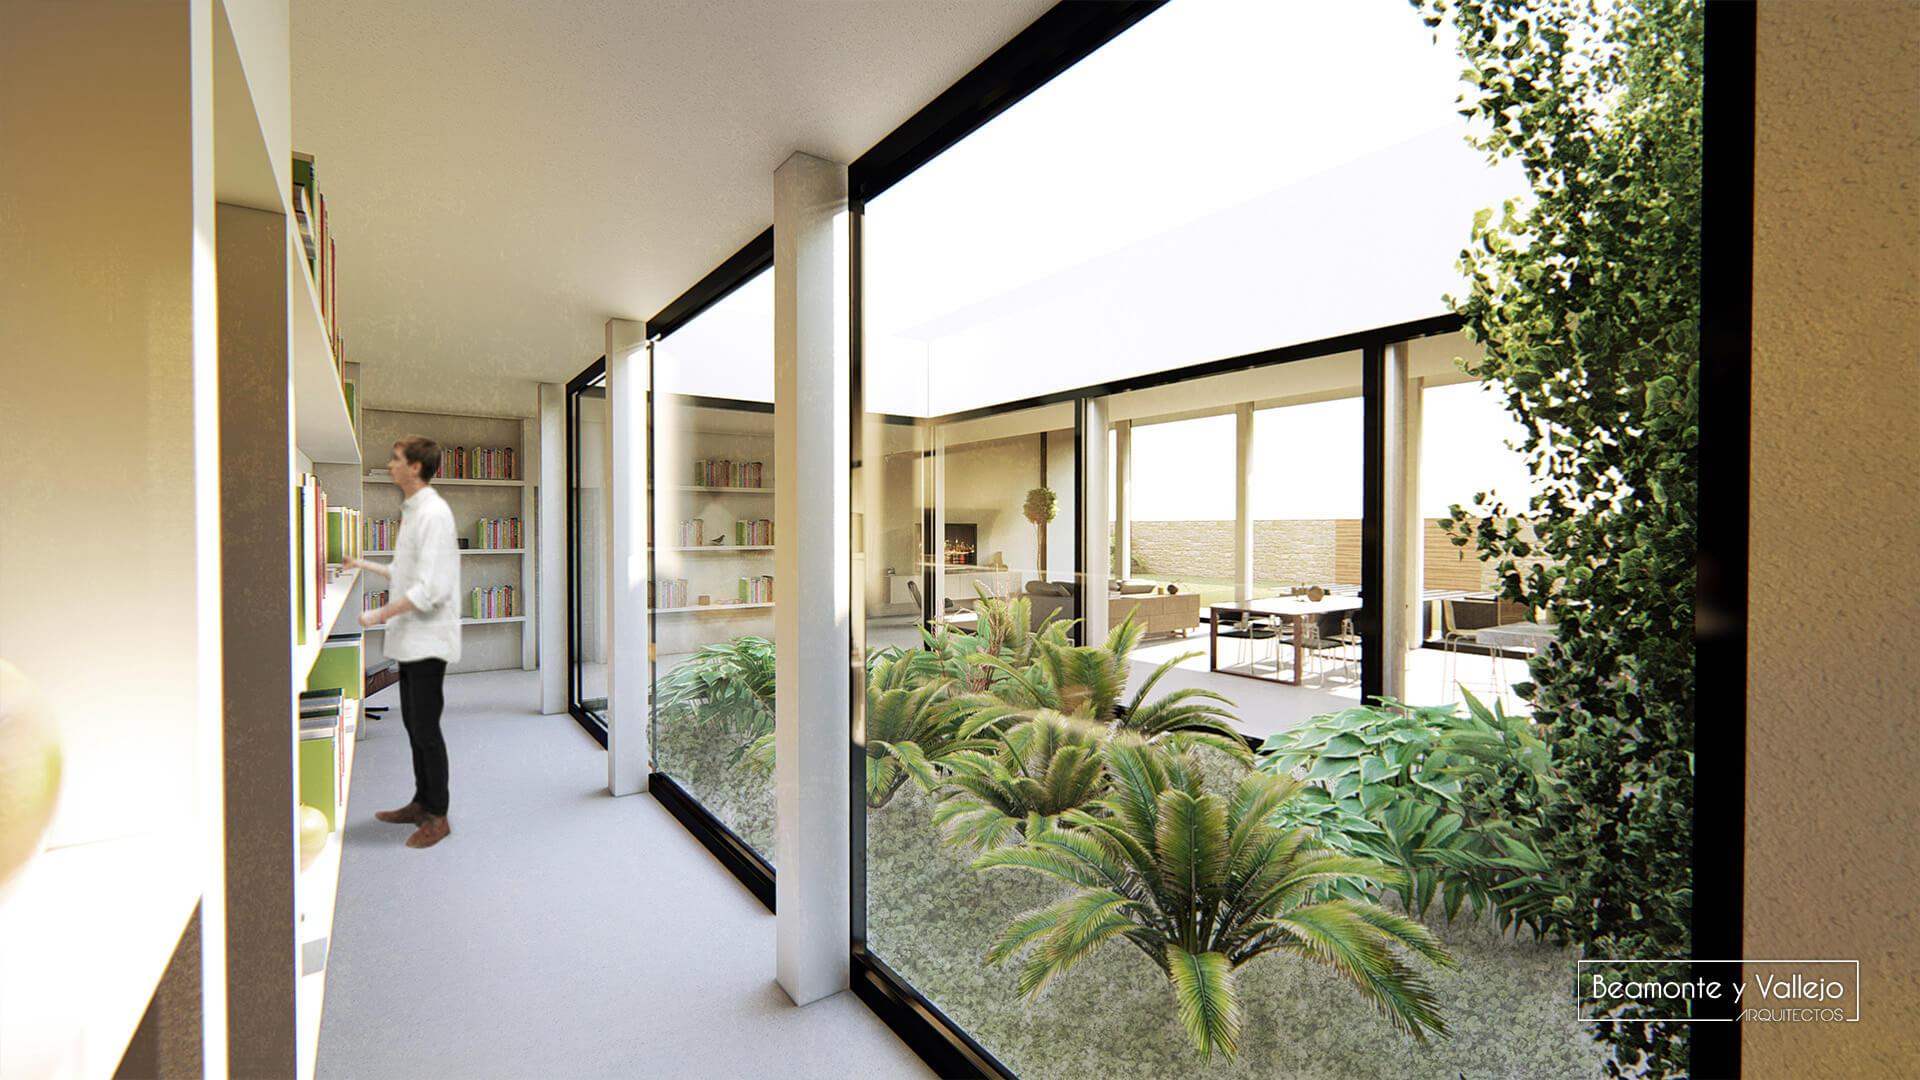 Beamonte y Vallejo arquitectos - Passivhaus El Zorongo, 5